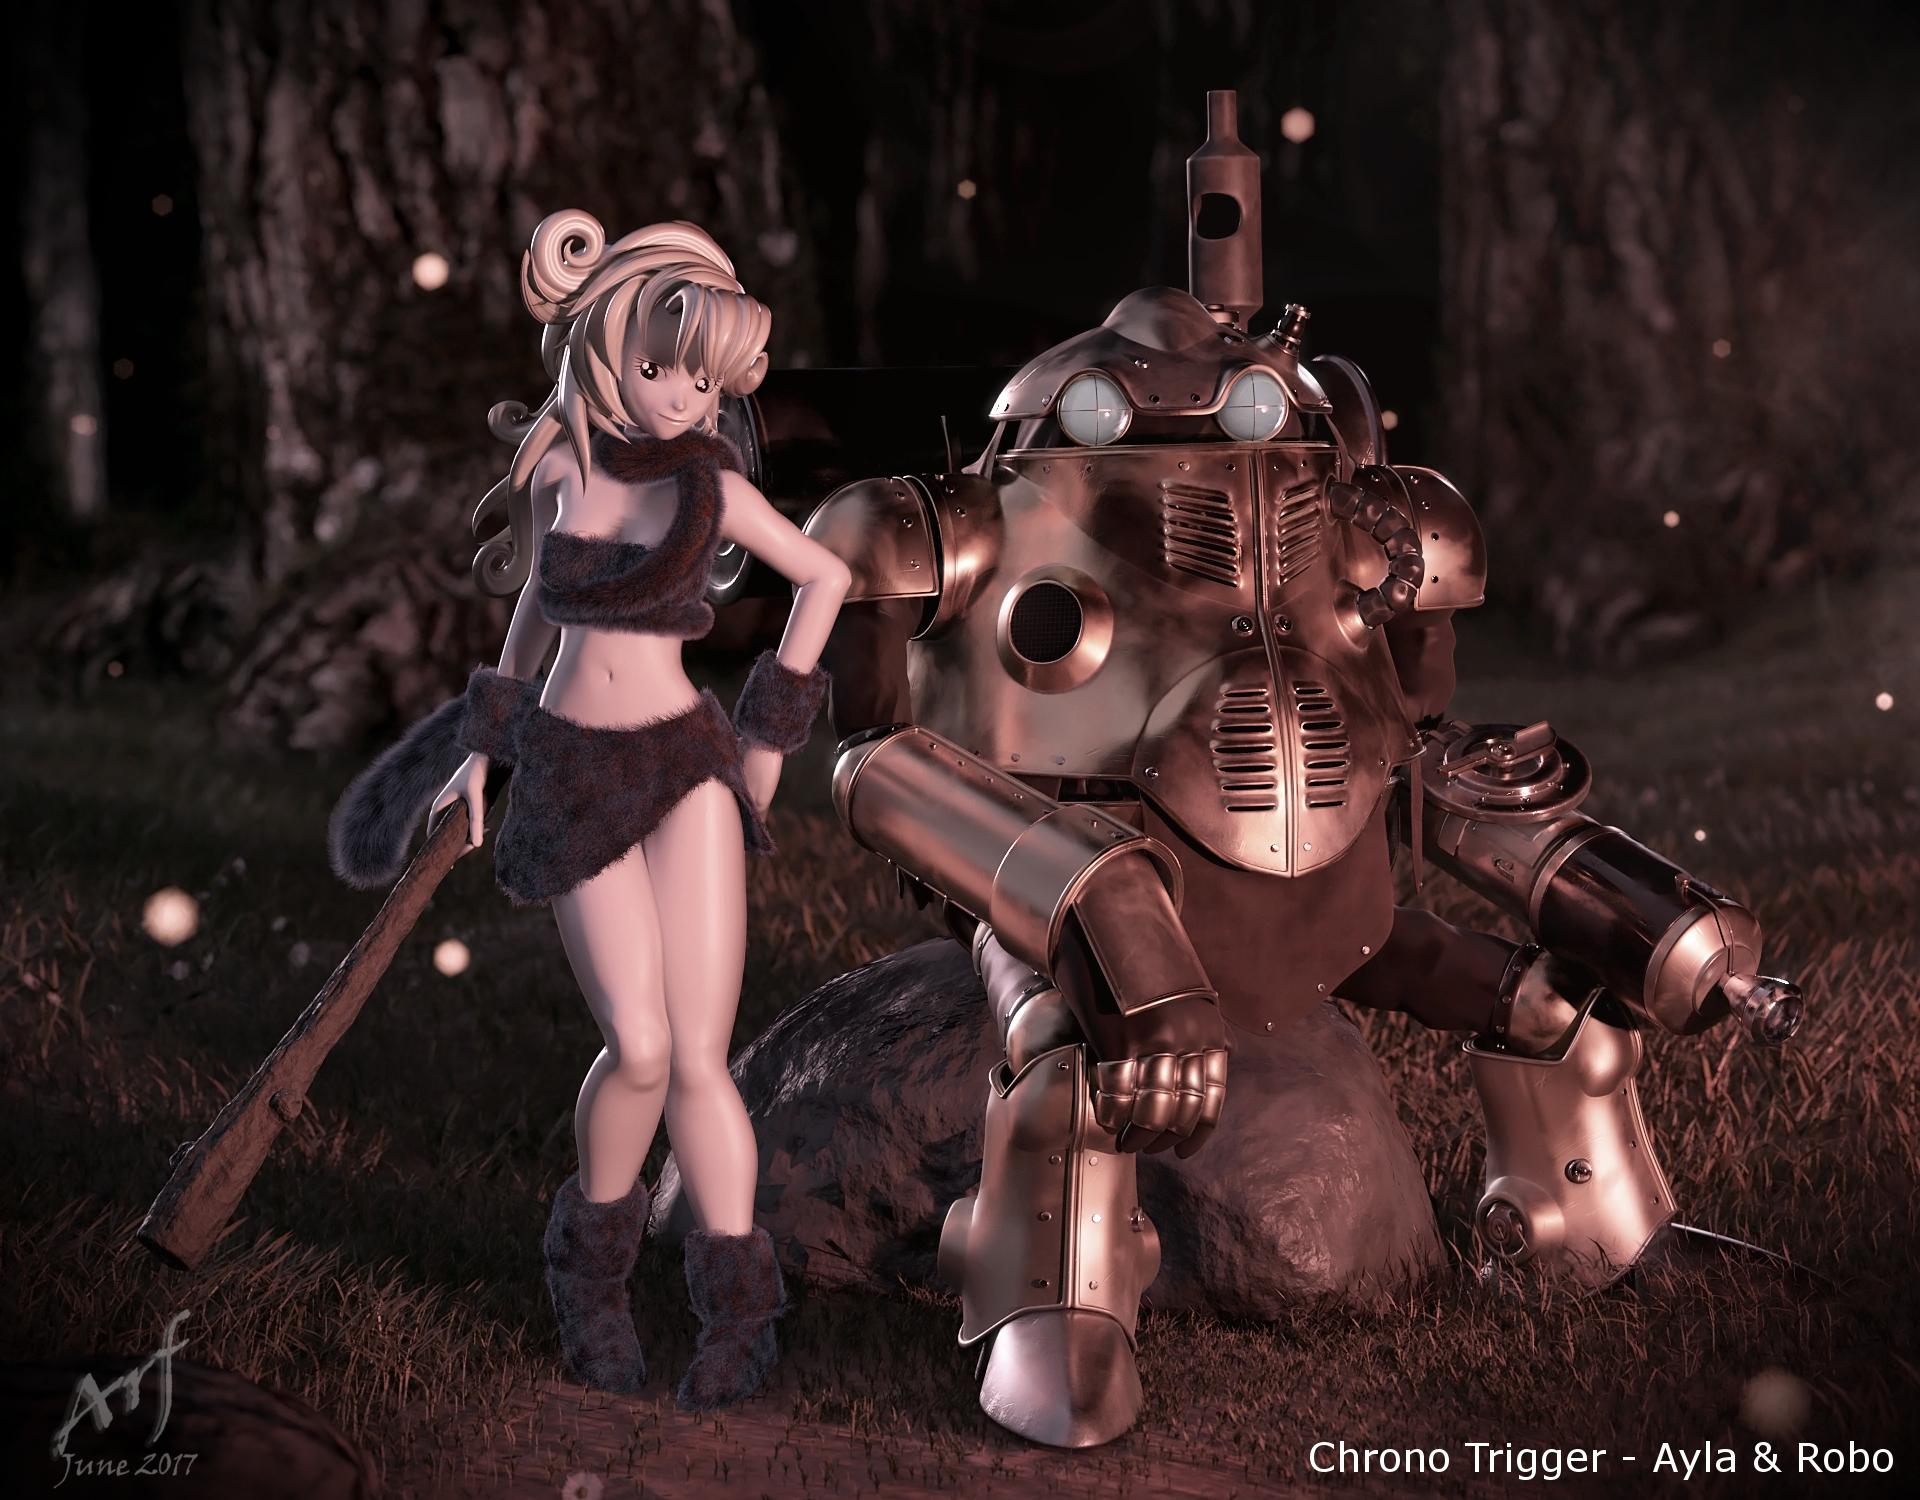 Ayla and Robo 3d art